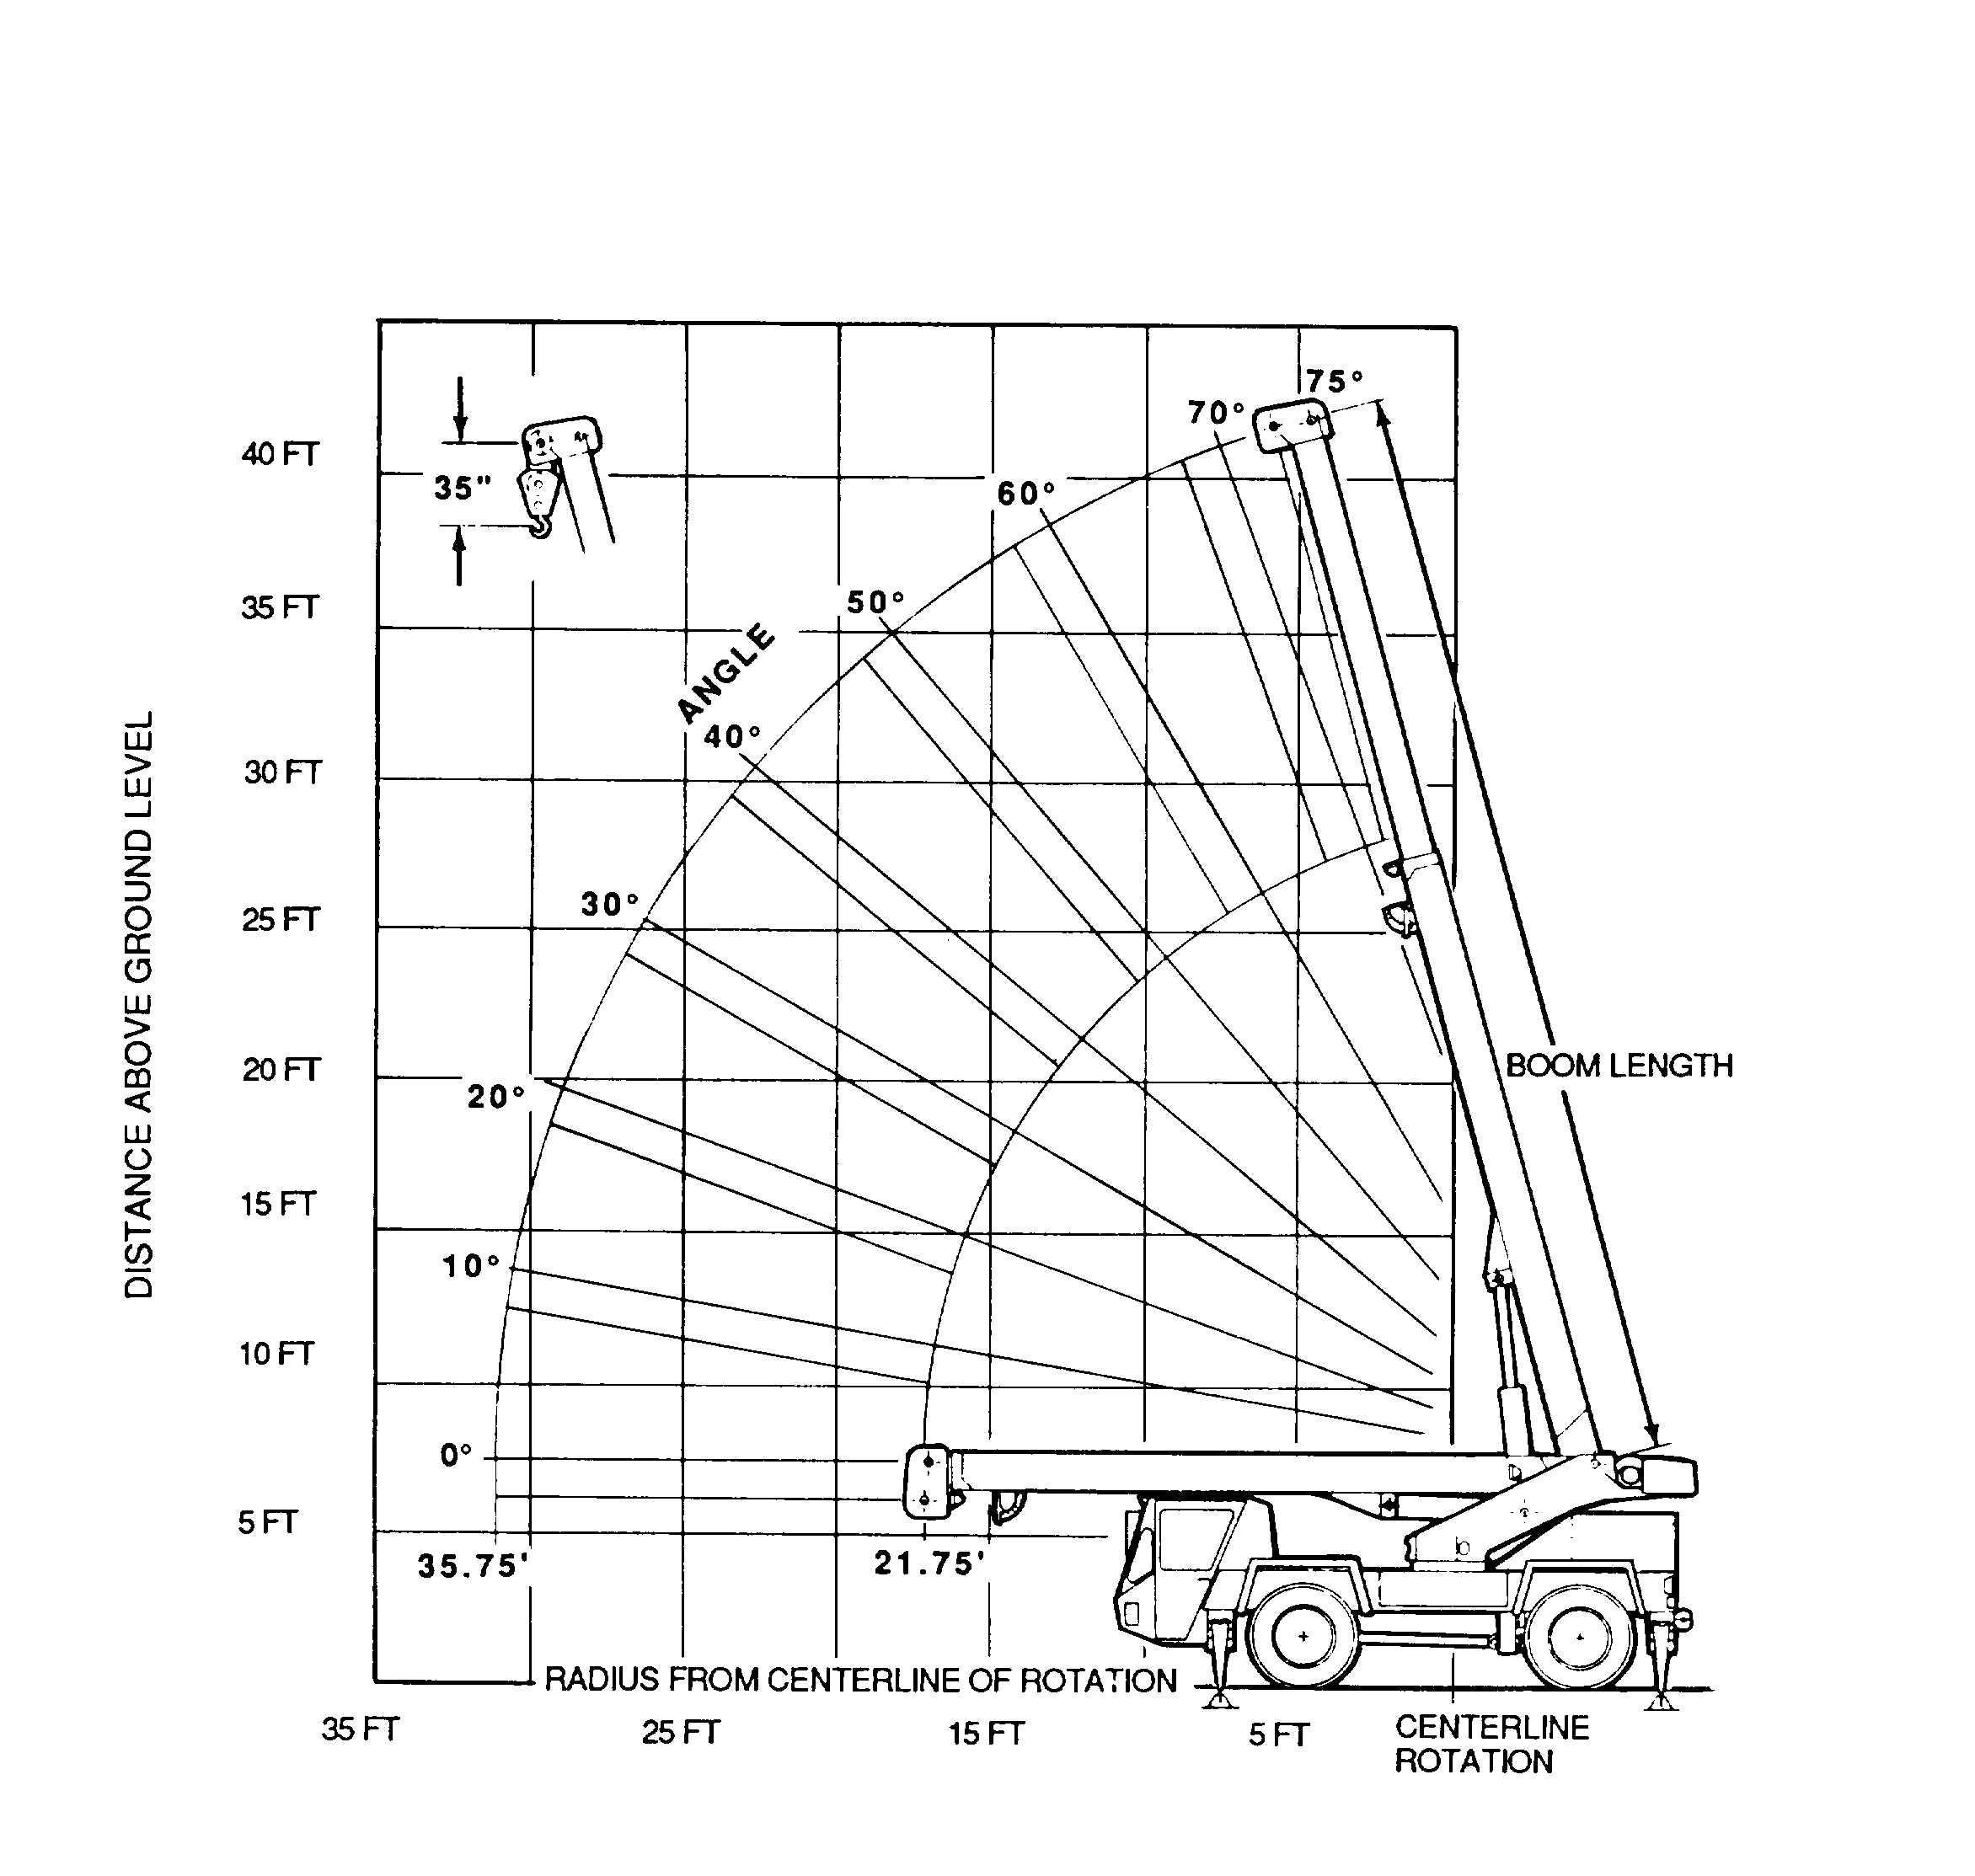 Figure 1 6 Radius From Centerline Of Rotation